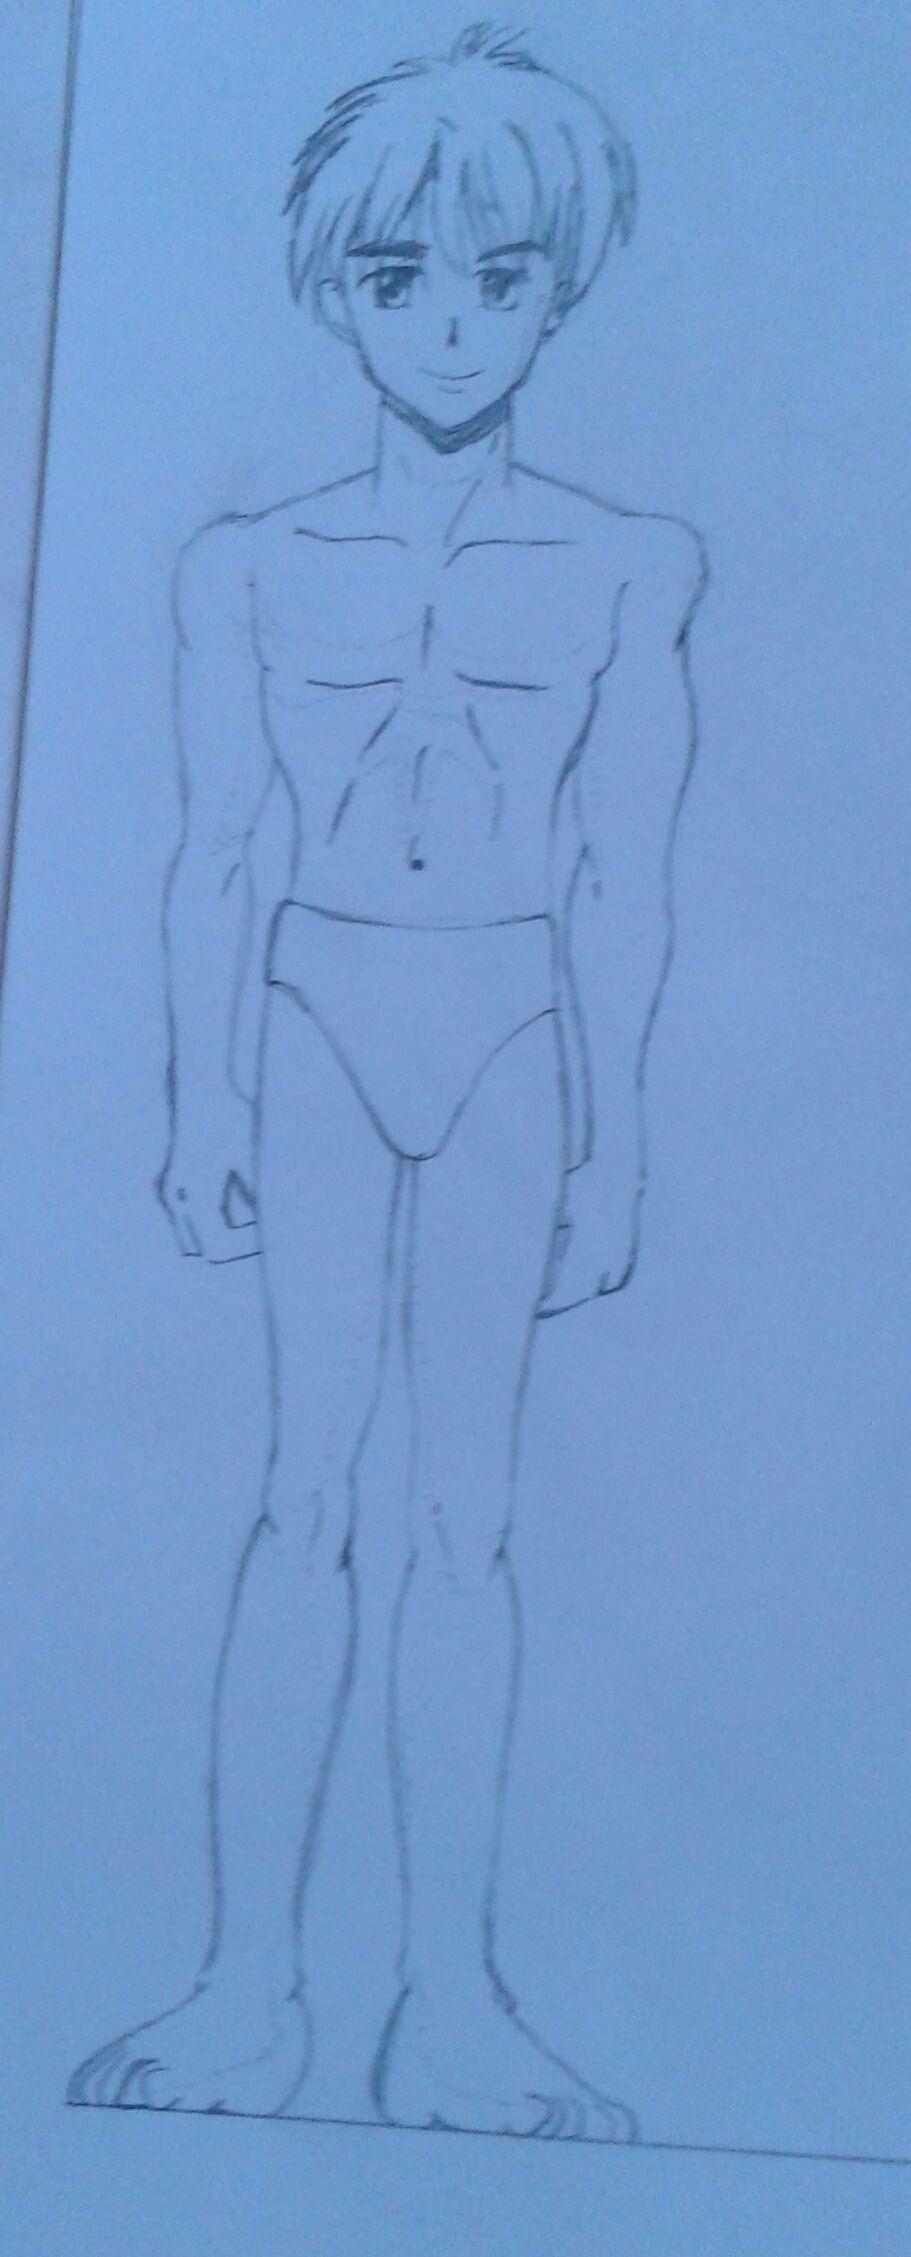 Körper eines jungen Manga | Zeichnungen | Pinterest | Manga, Jungen ...